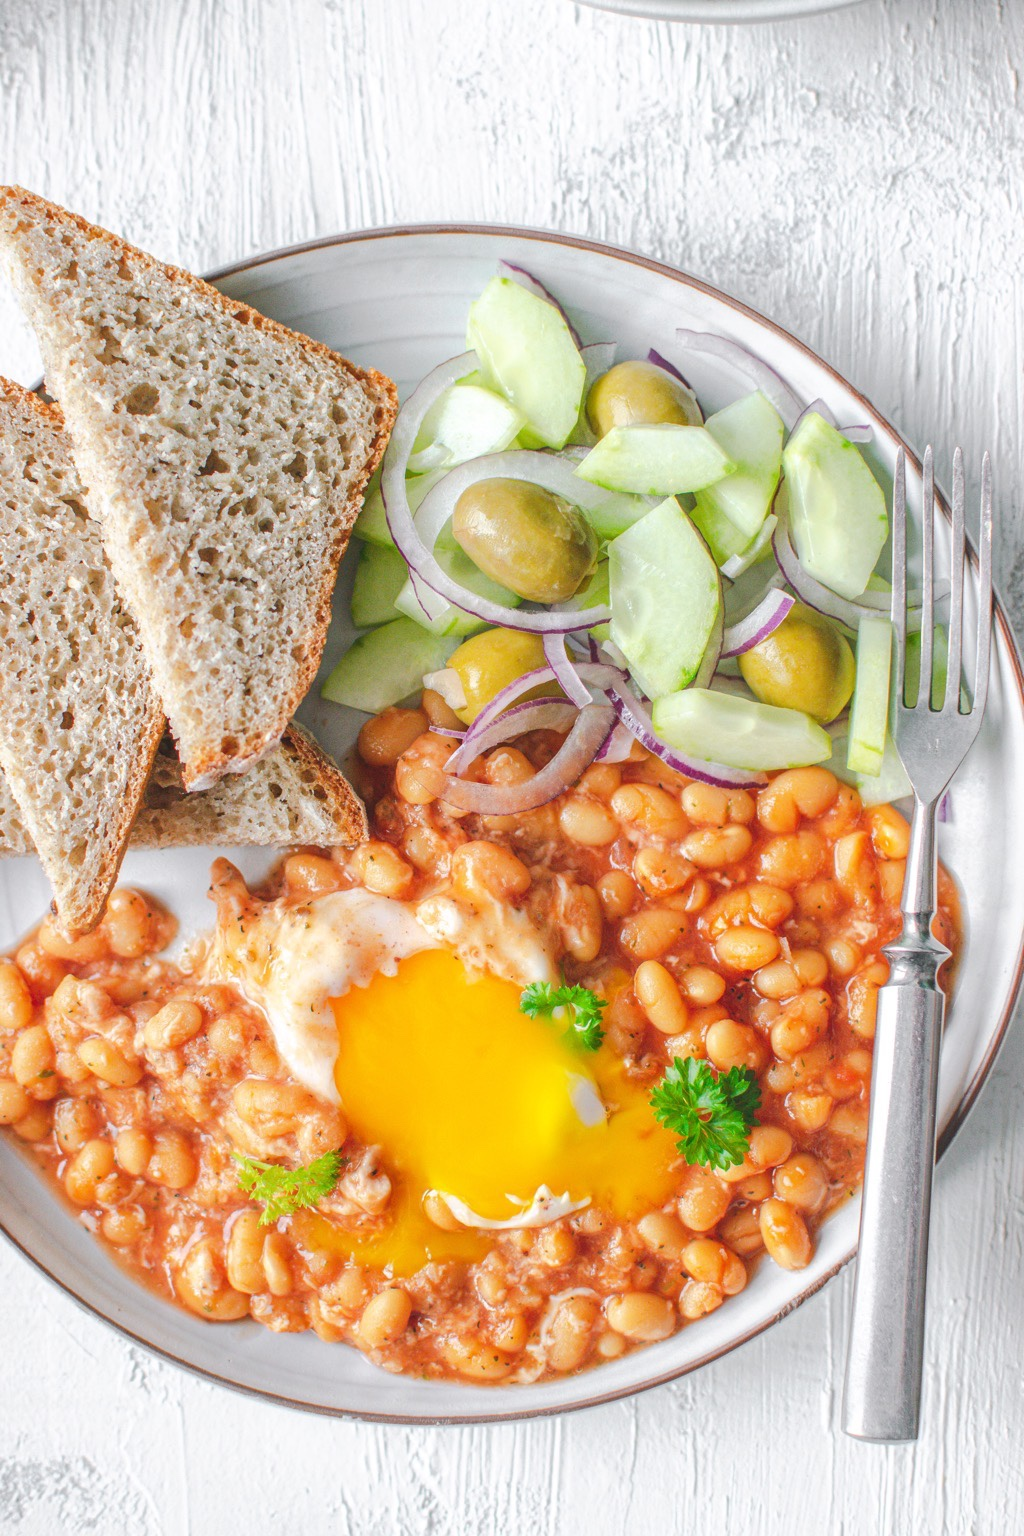 Fasolka-pomidorowa-jajko-sałatka